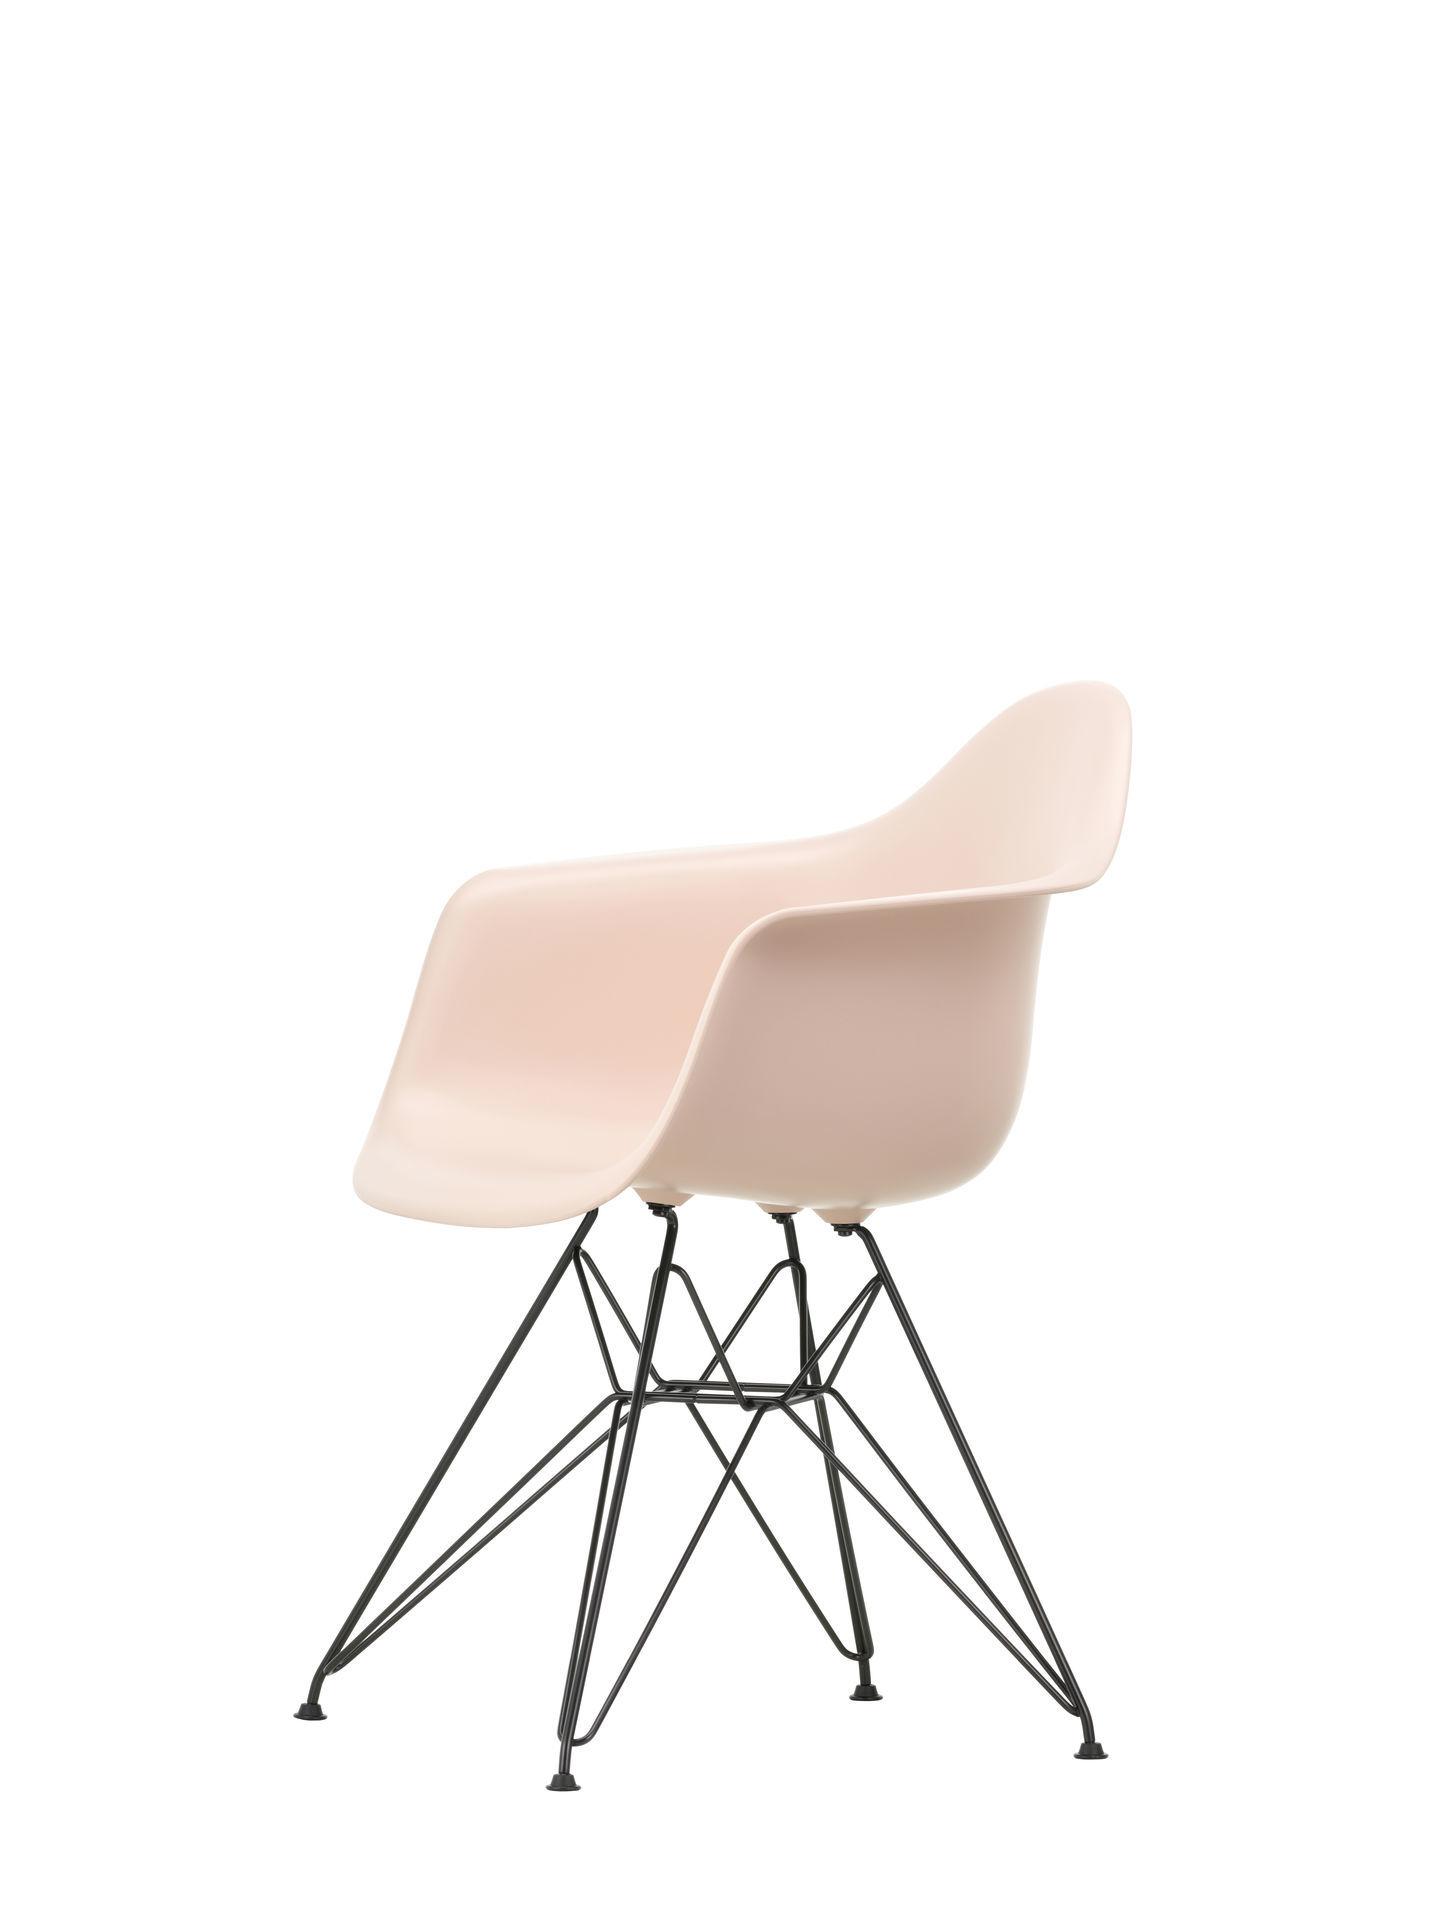 Eames Plastic Arm Chair DAR Stuhl Vitra Schwarz - Rostorange